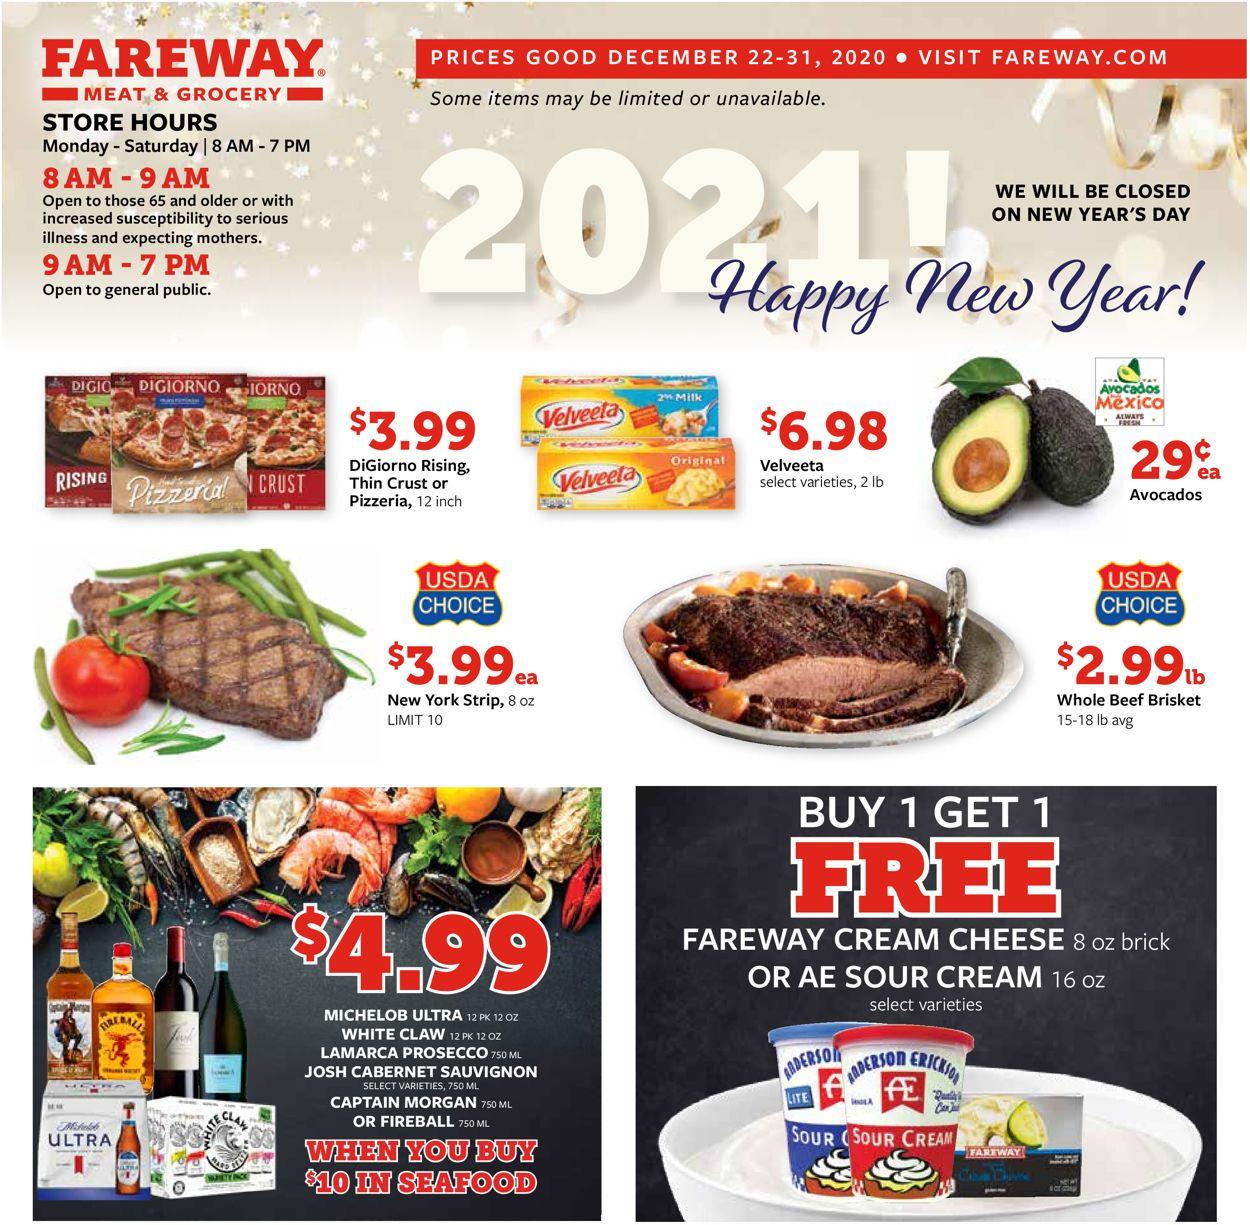 Fareway Weekly Ad Circular - valid 12/22-12/31/2020